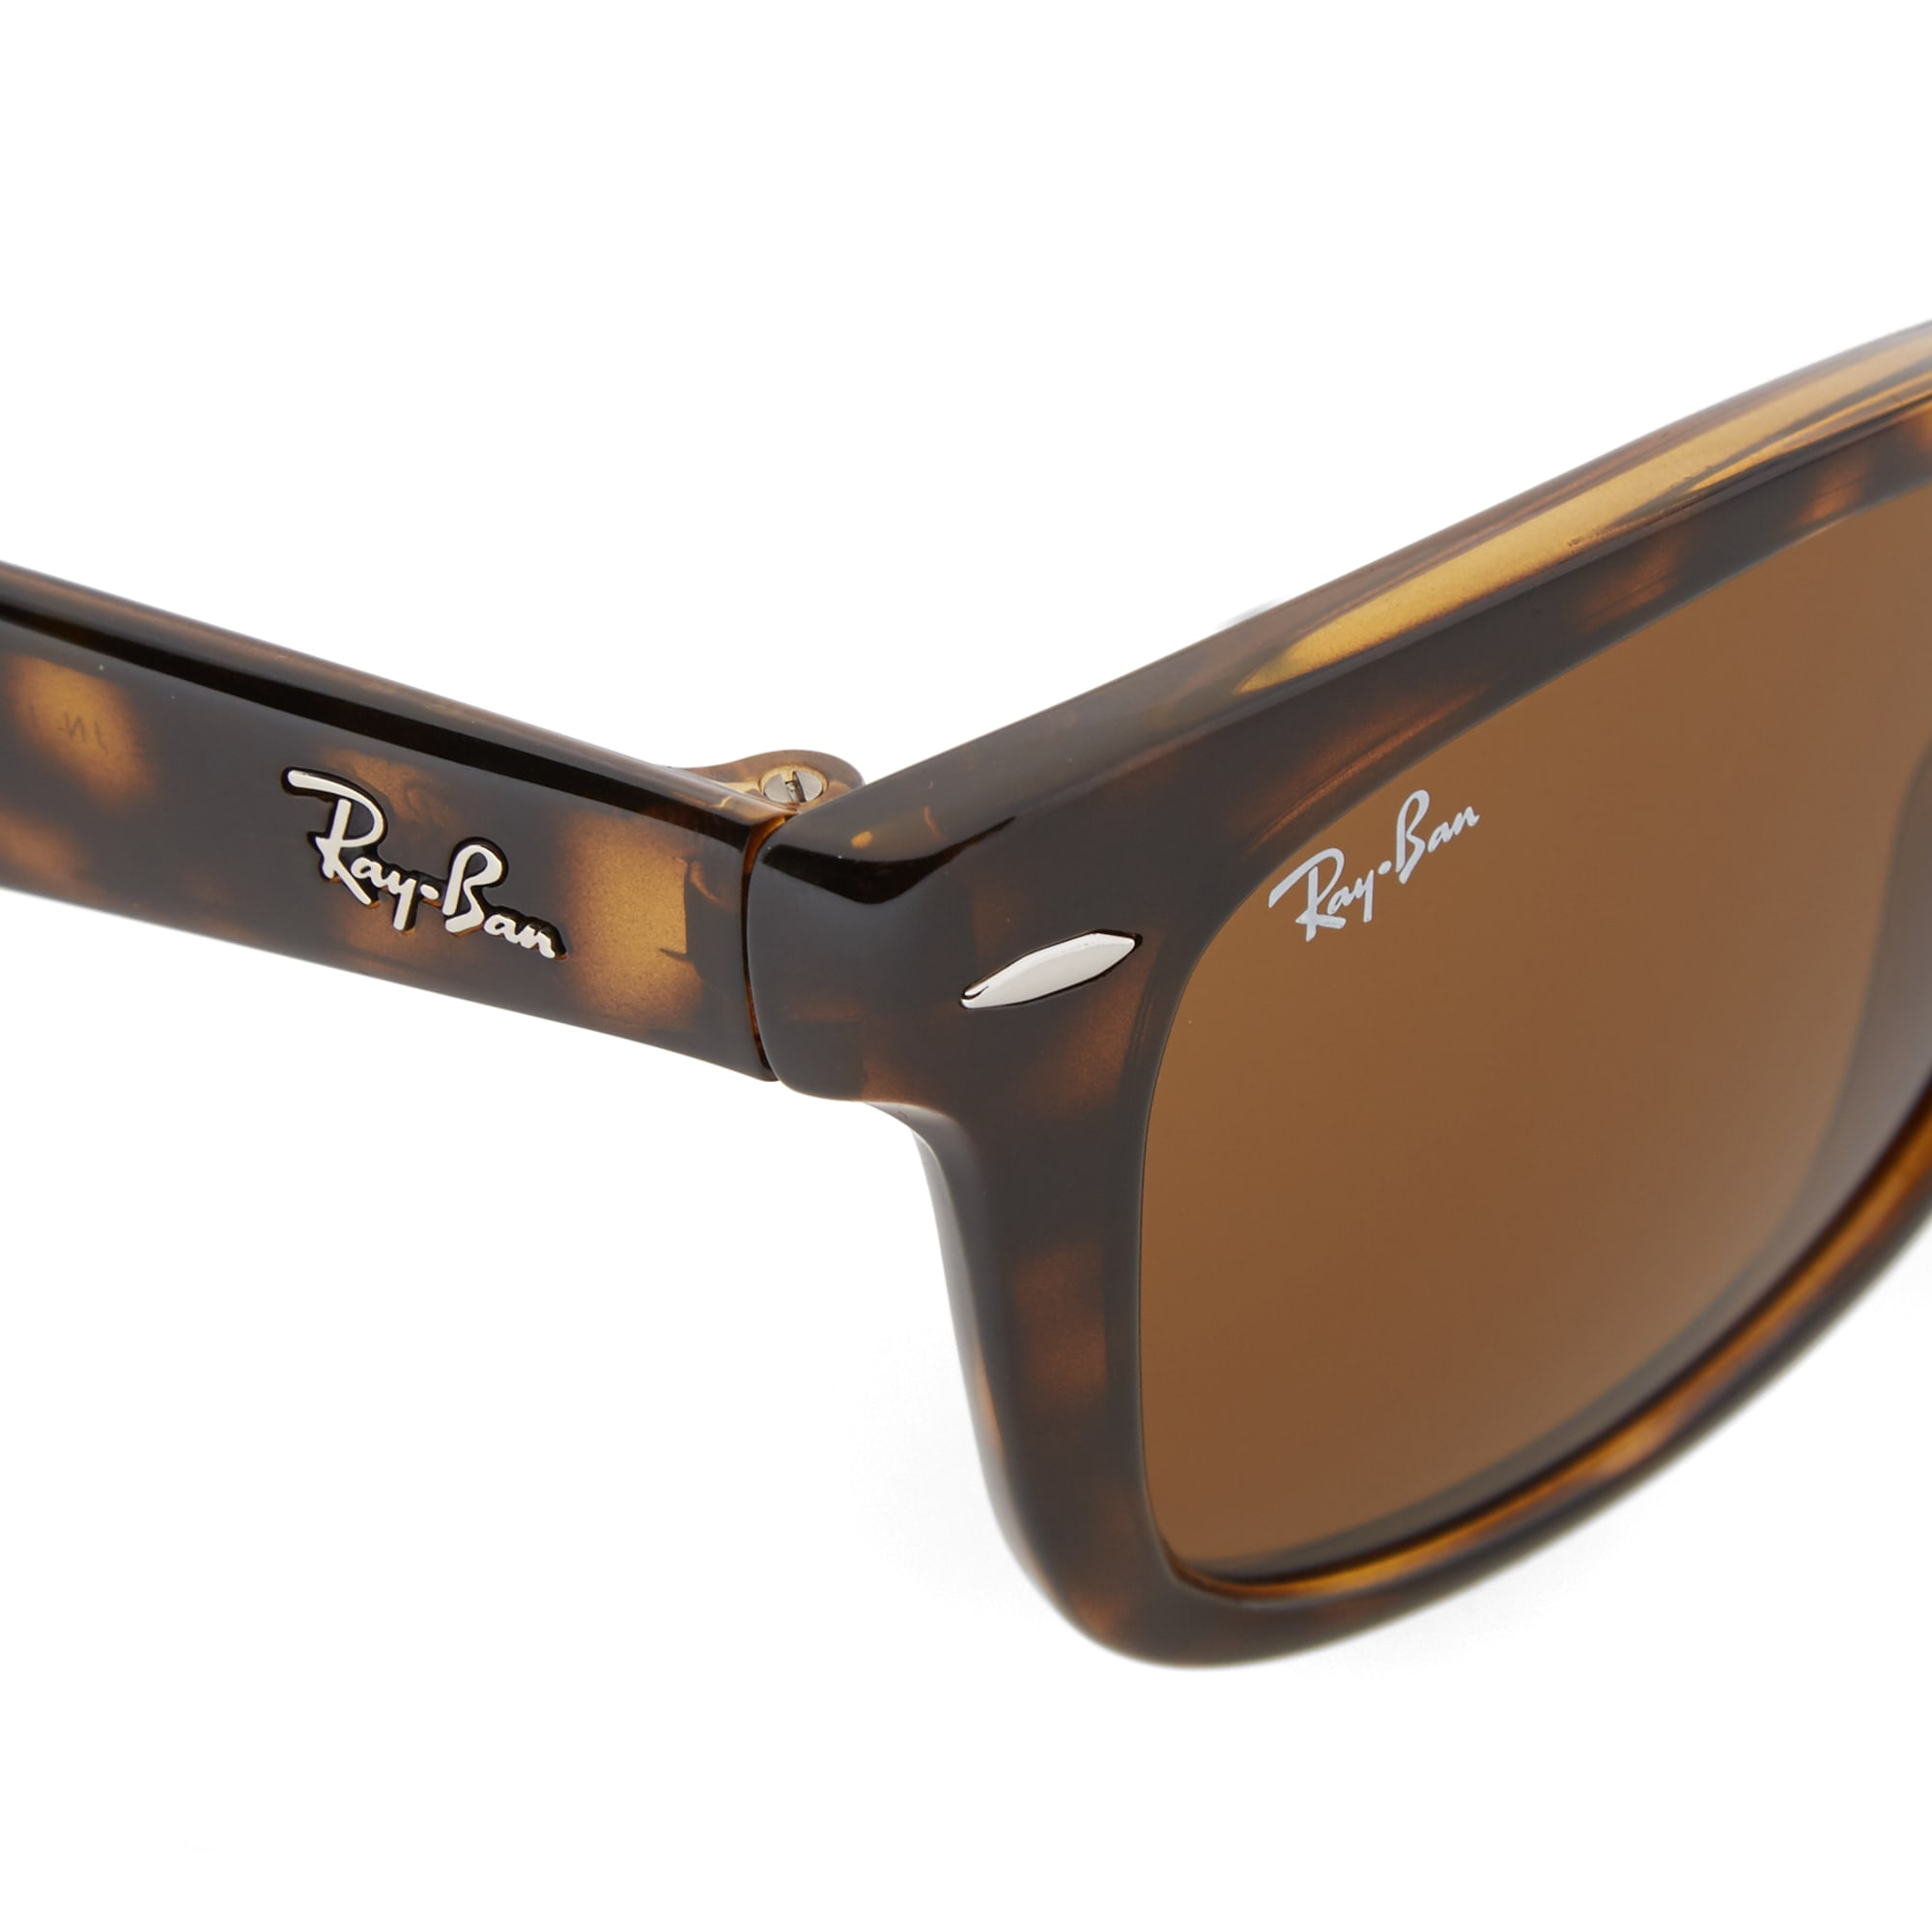 07d5ba7cefc Ray Ban Wayfarer Folding Sunglasses (Light Havana   Brown)